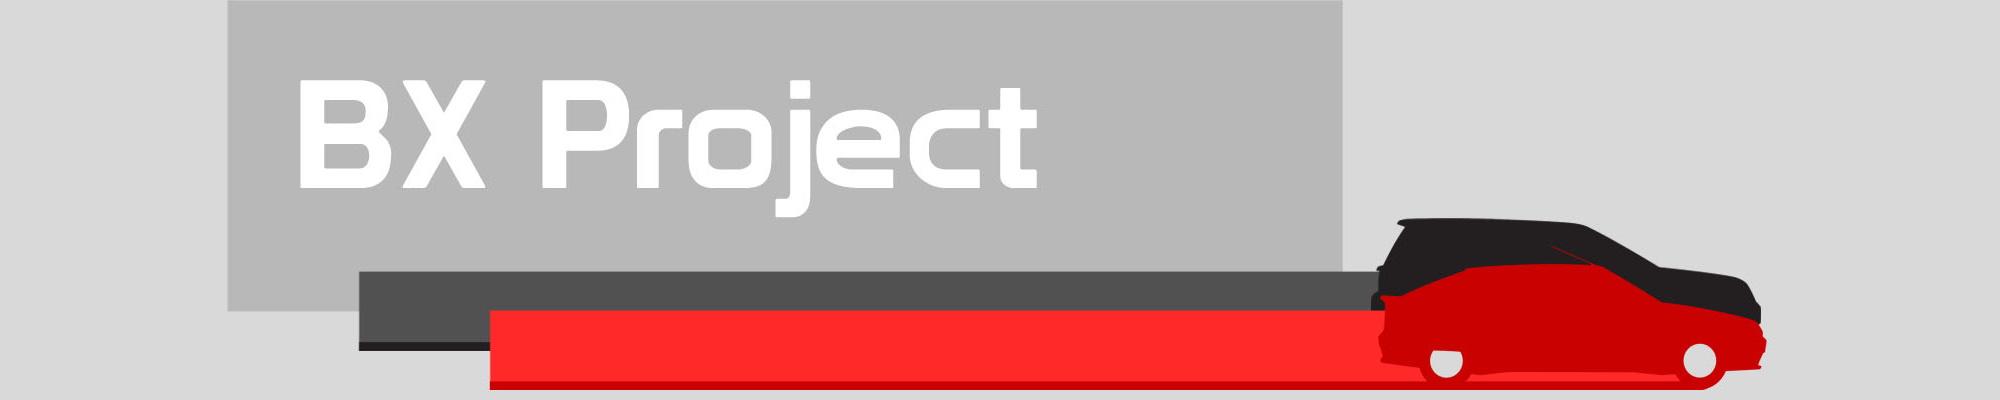 BX Project